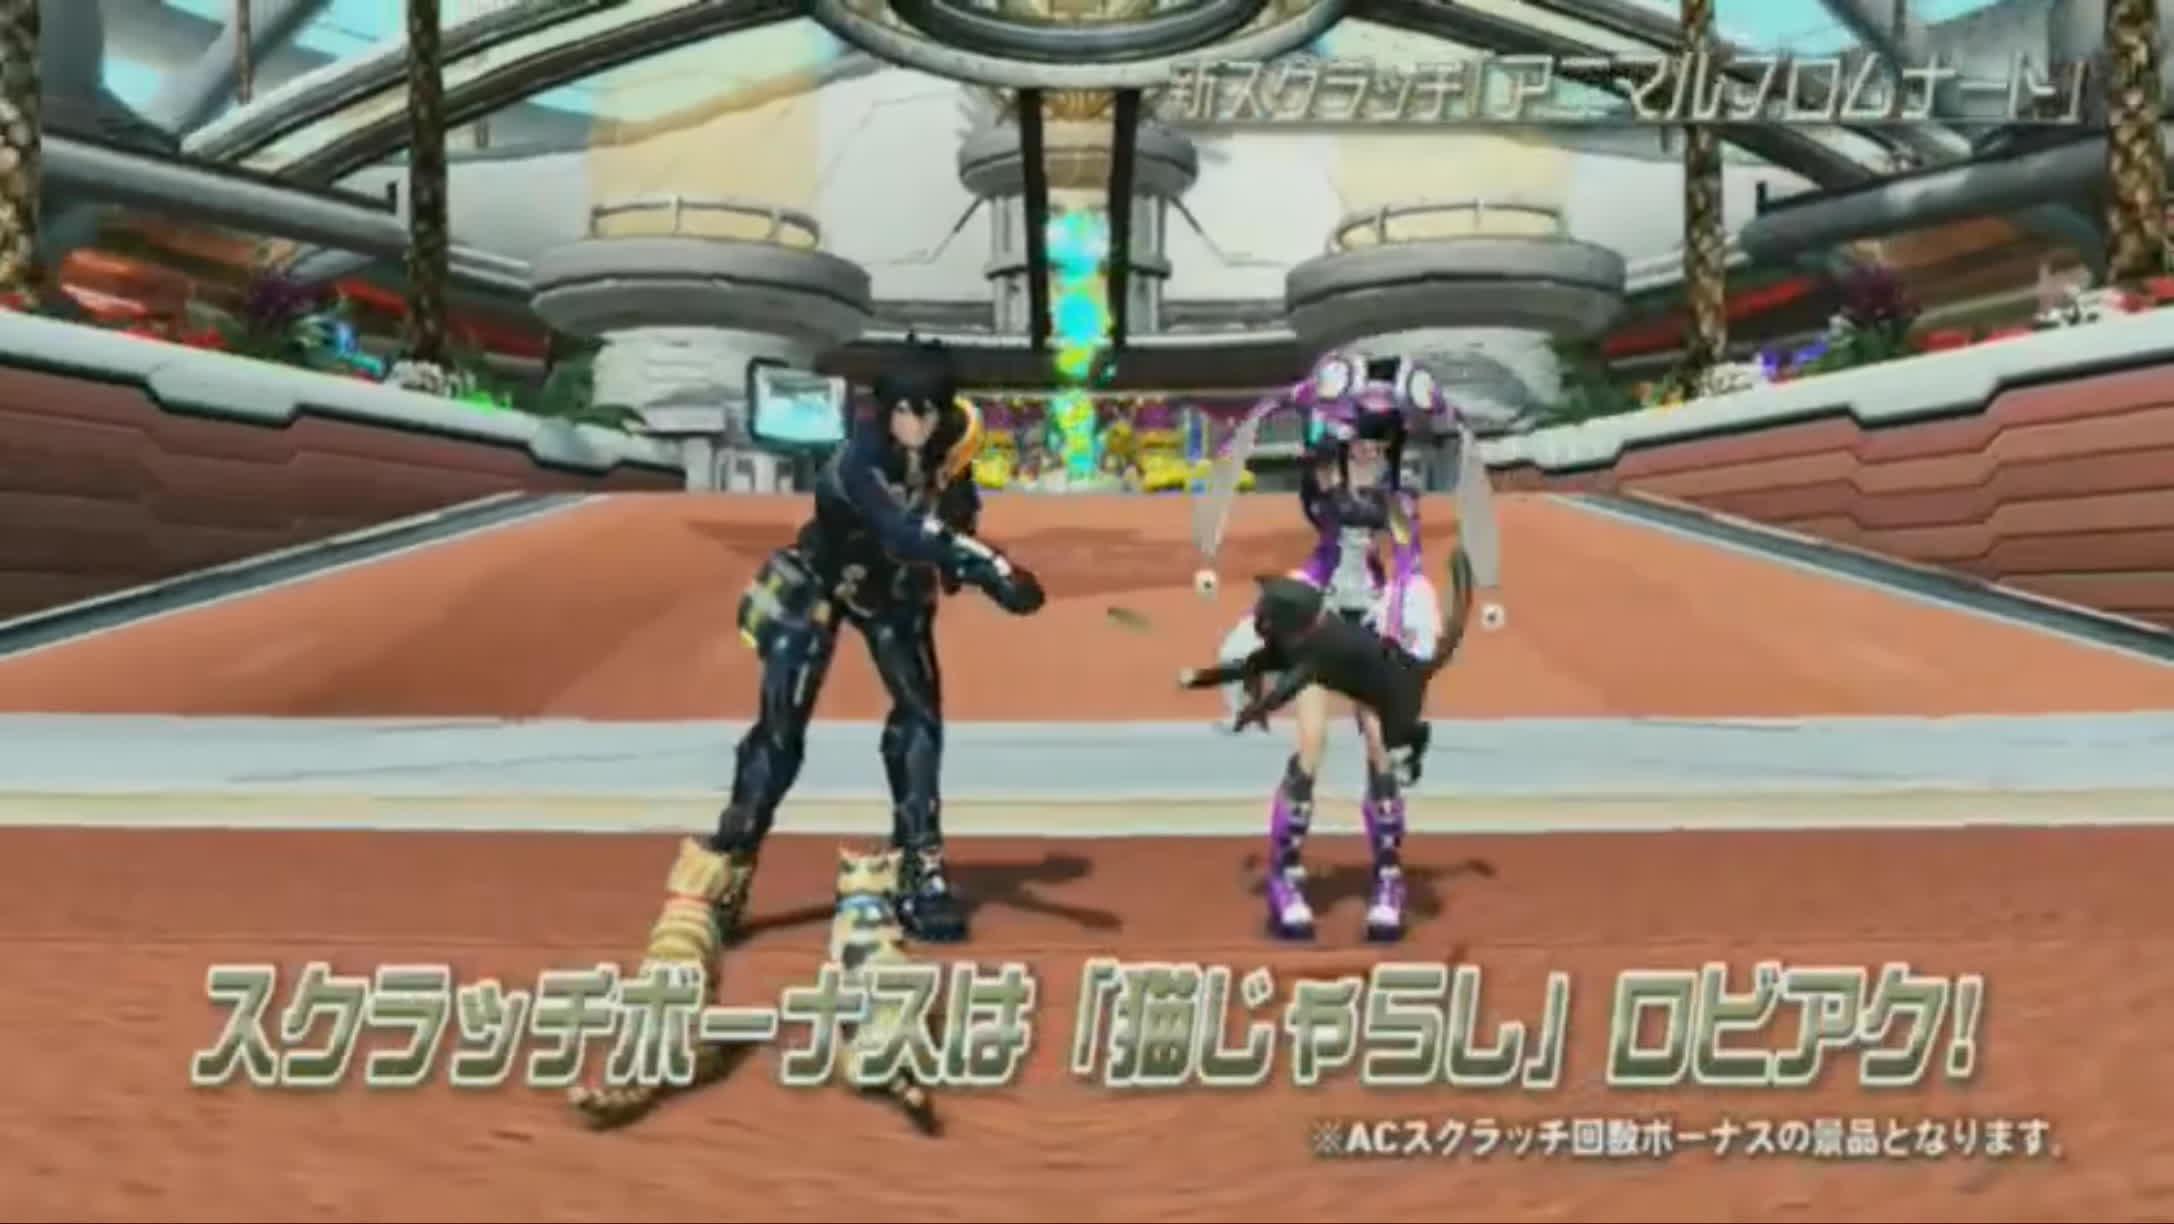 phantasy star online 2, pso2, sega, PSO2 Station#6 New Raid Boss And Battle Arena Update GIFs